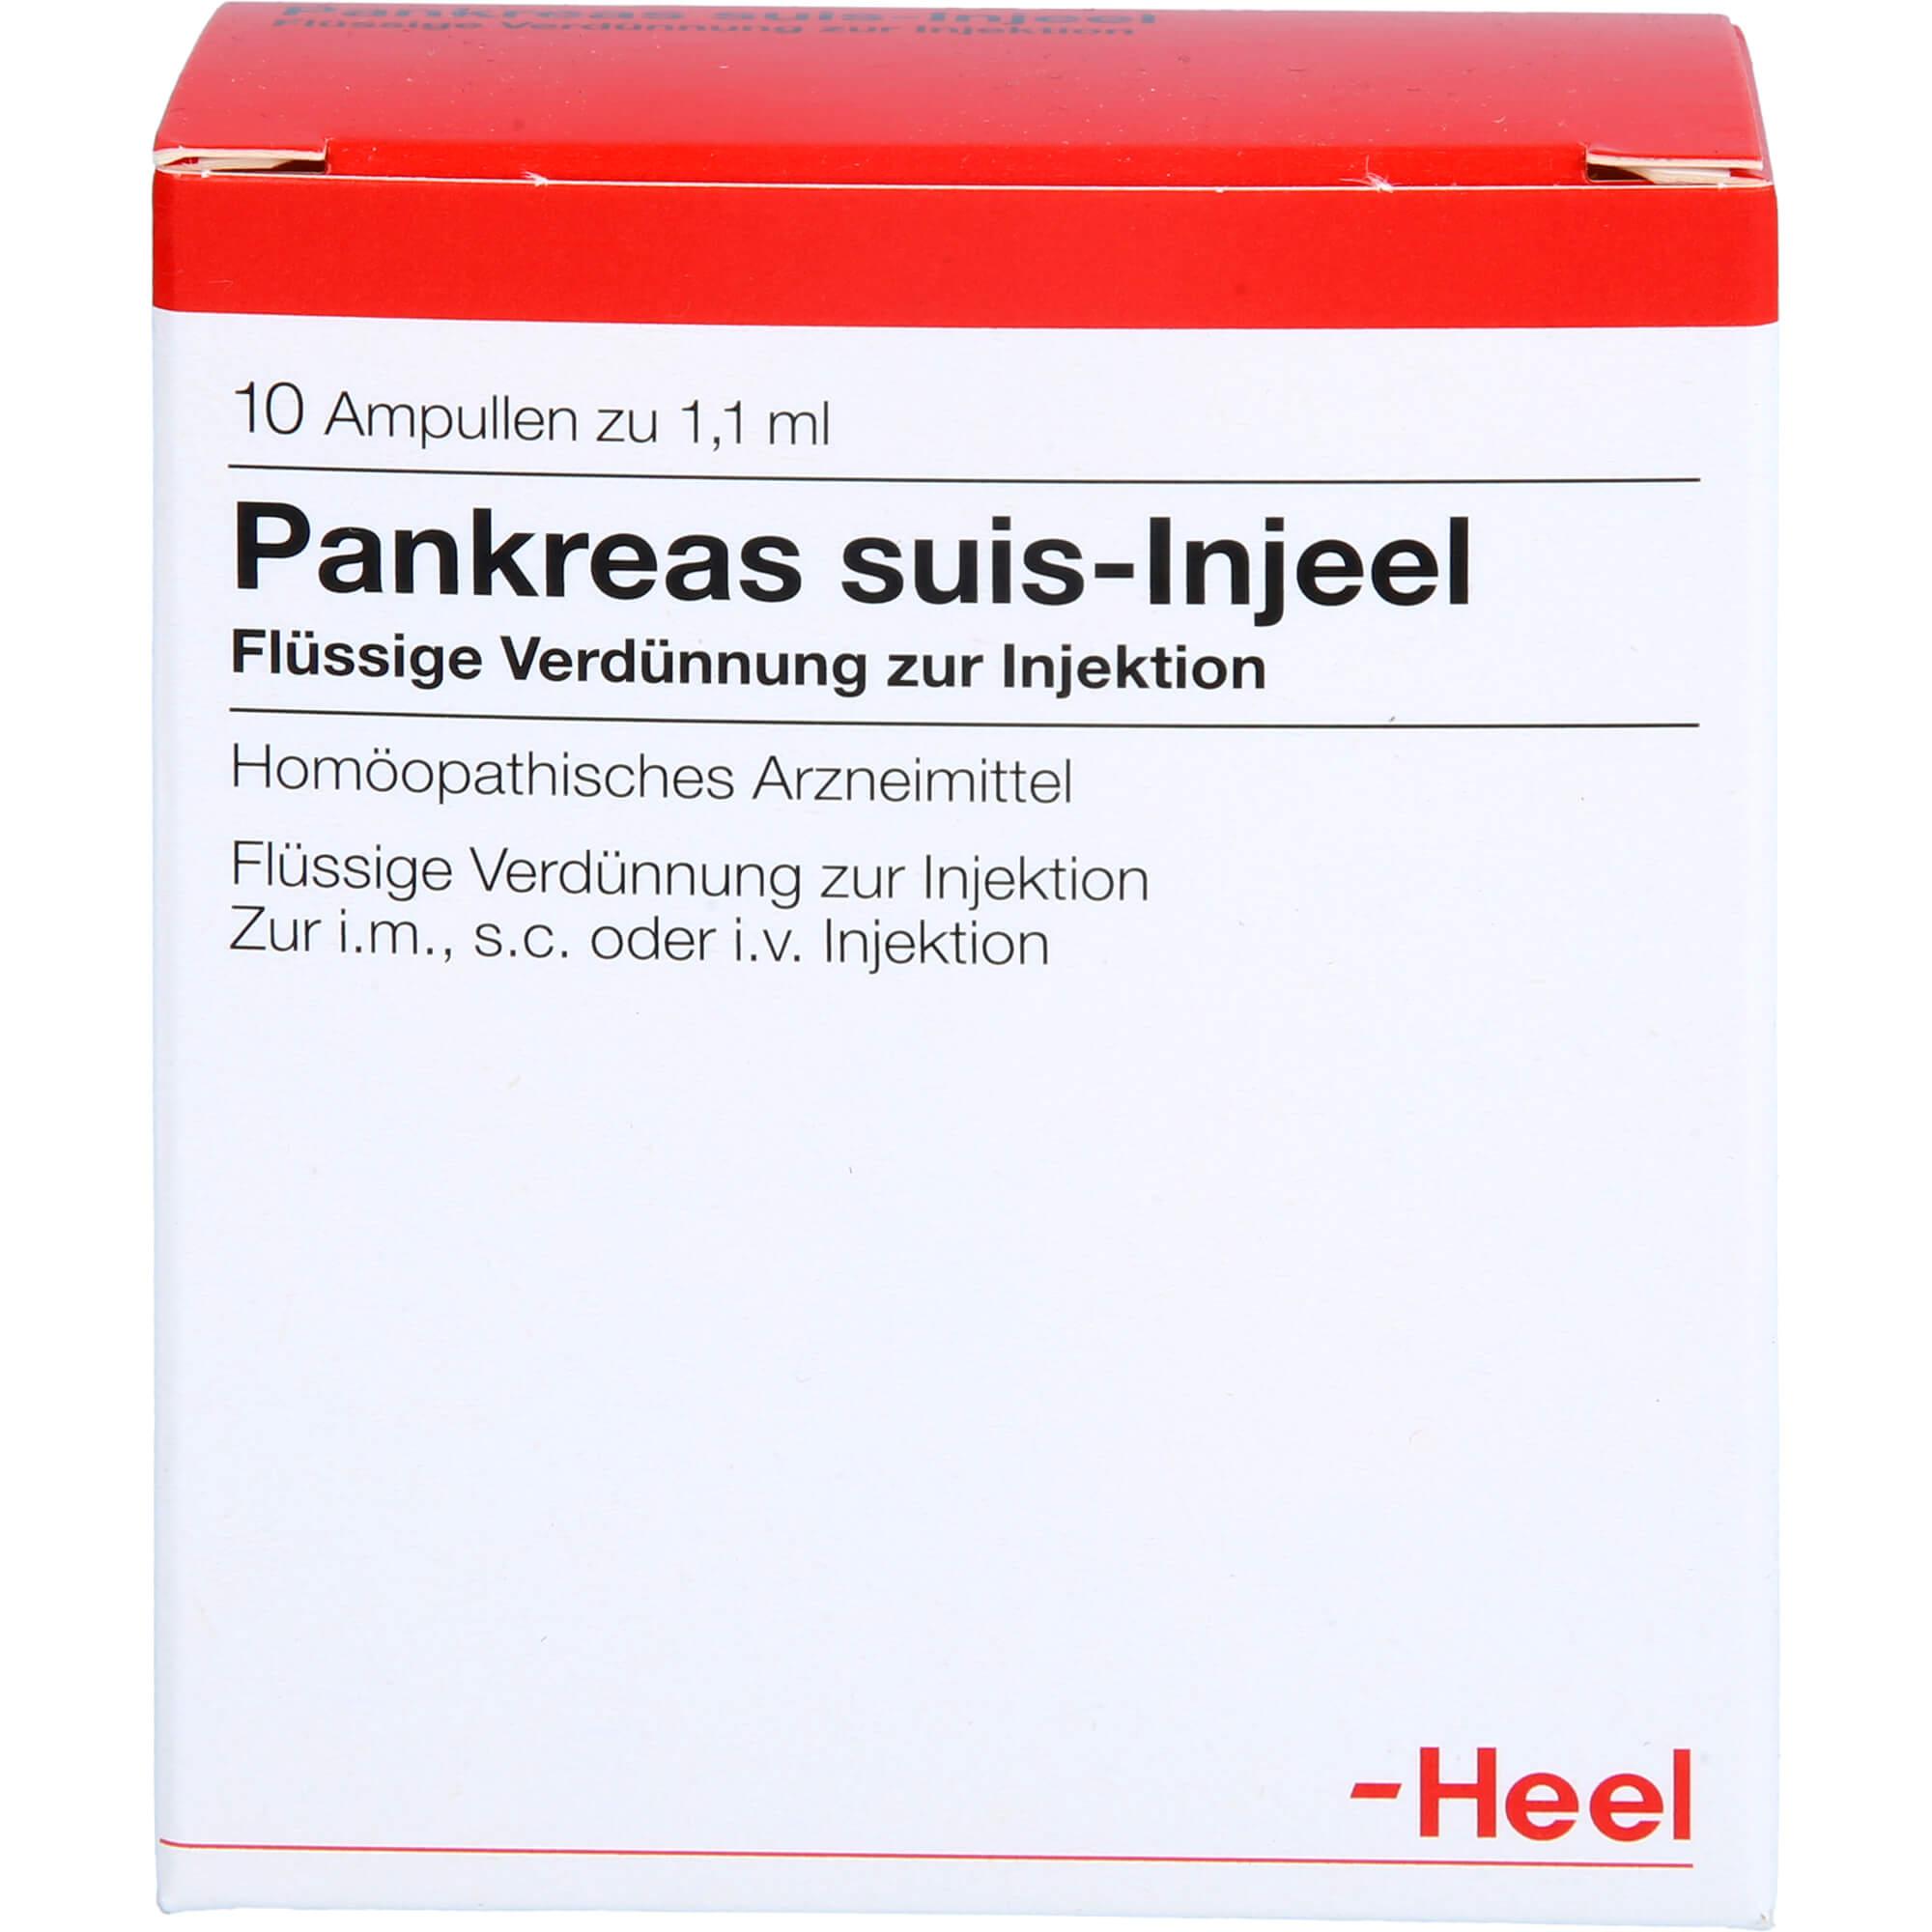 PANKREAS SUIS Injeel Ampullen